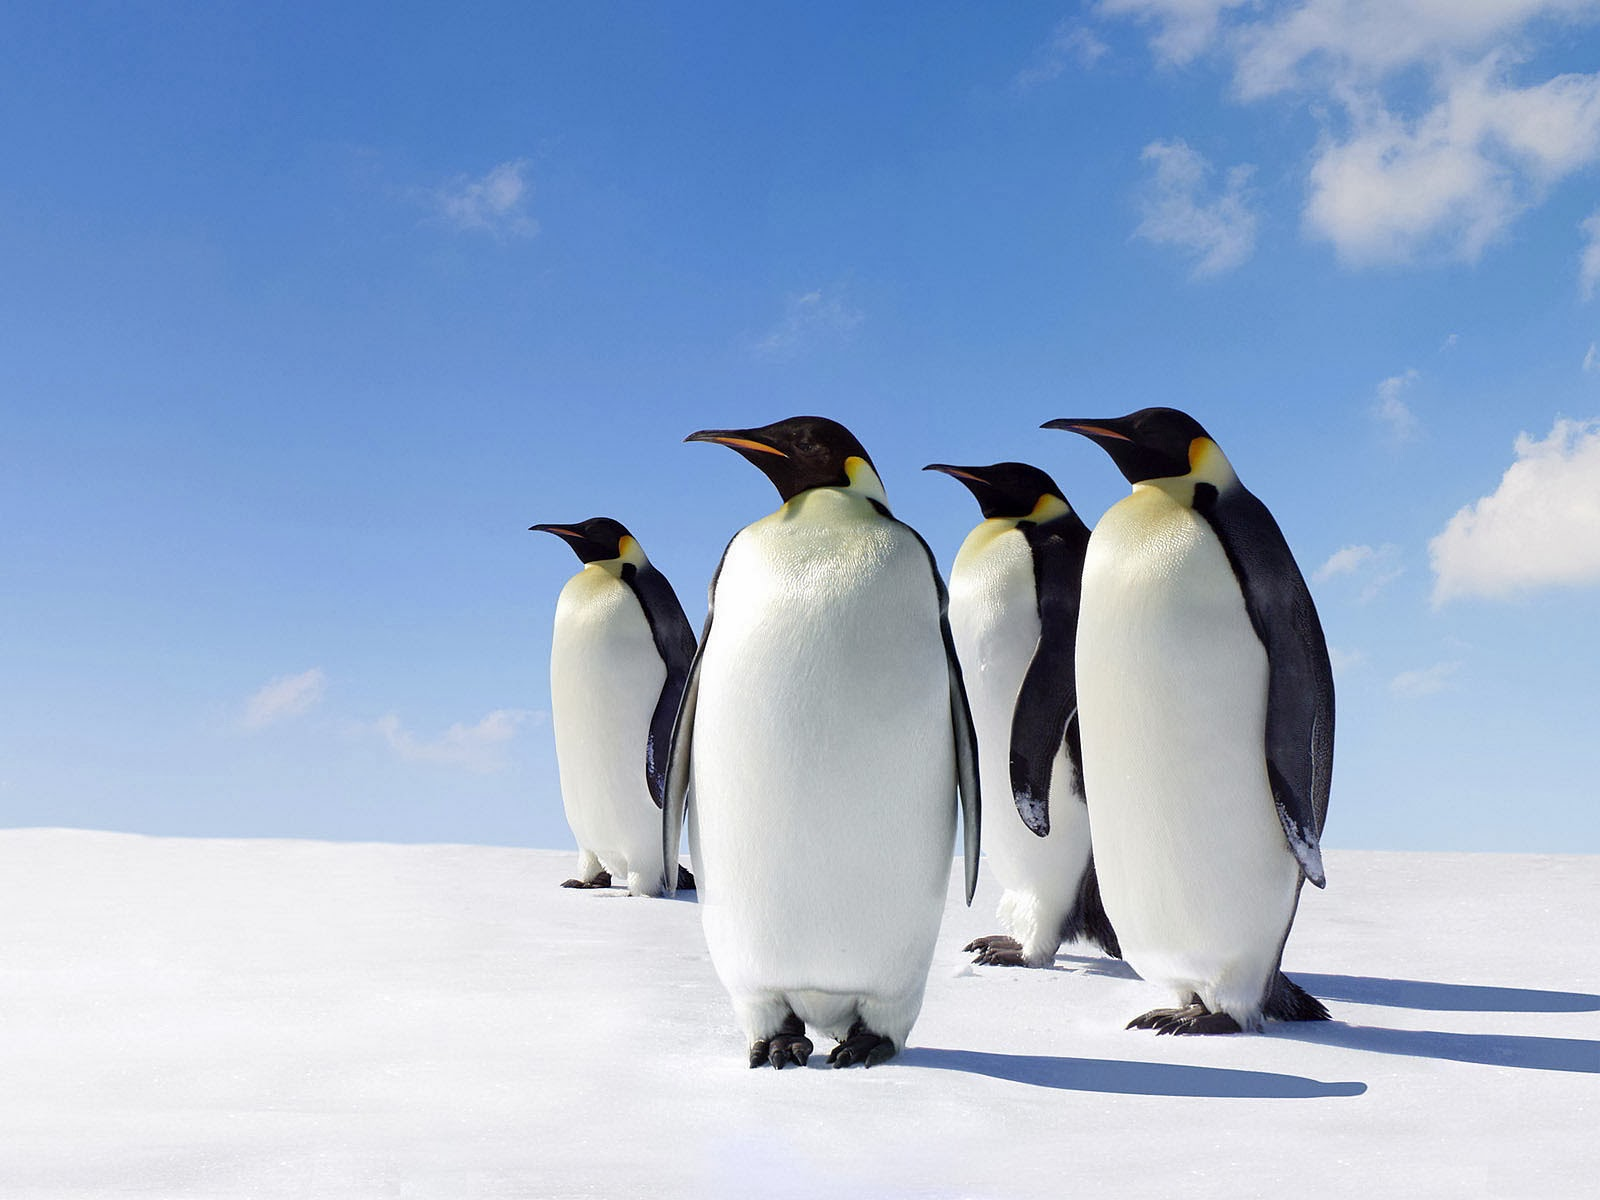 penguin wallpaper wallpapers - photo #33